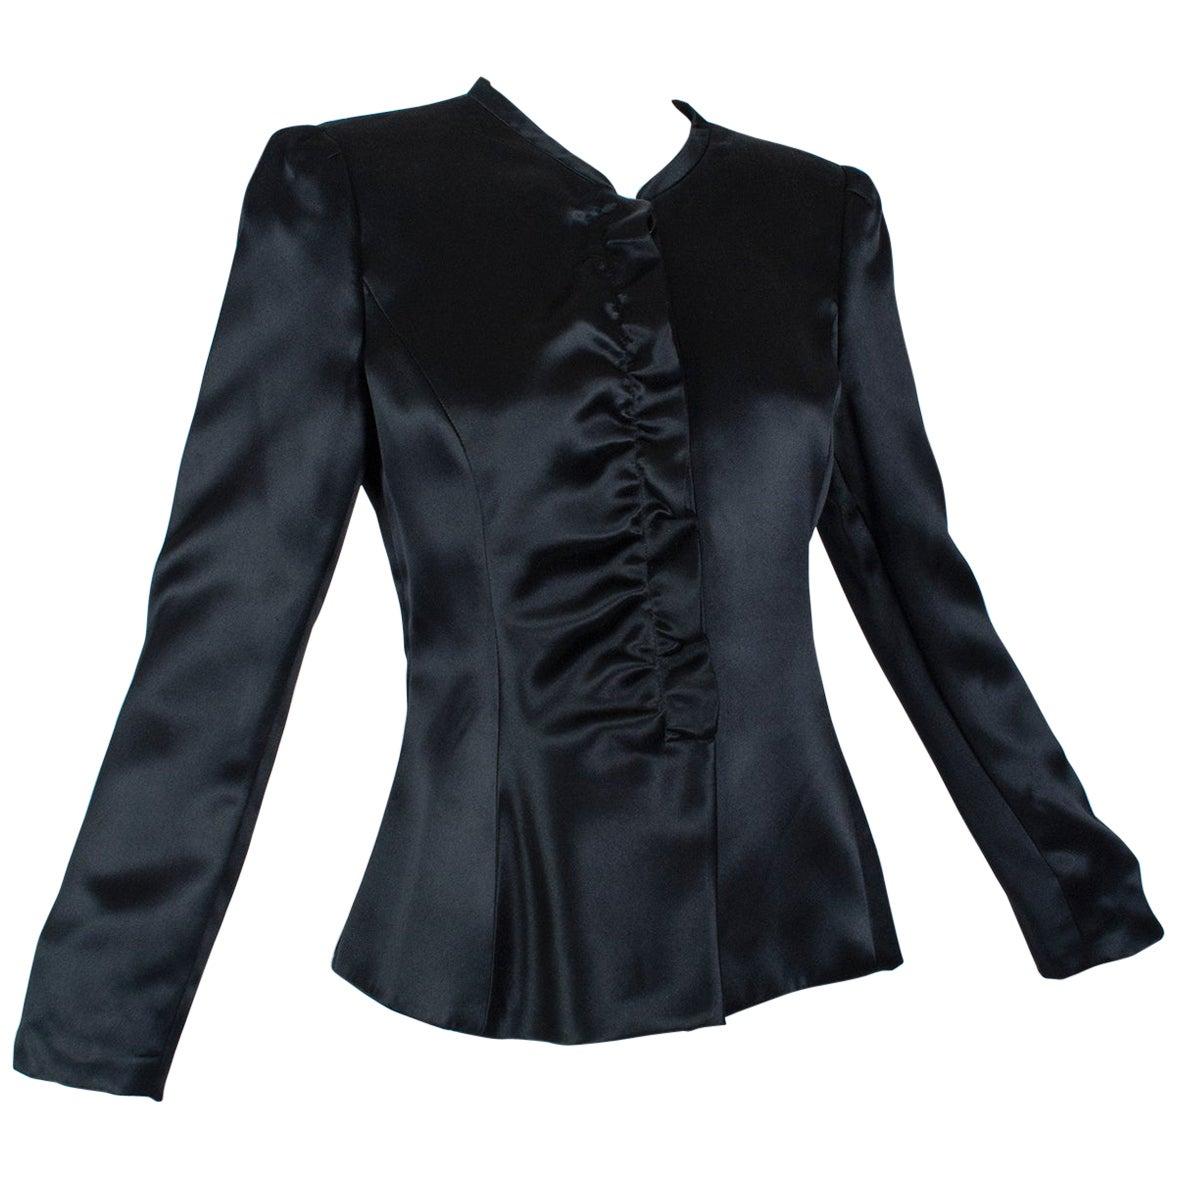 Giorgio Armani Black Satin Ruffle Placket Evening Jacket - US 6, 2003